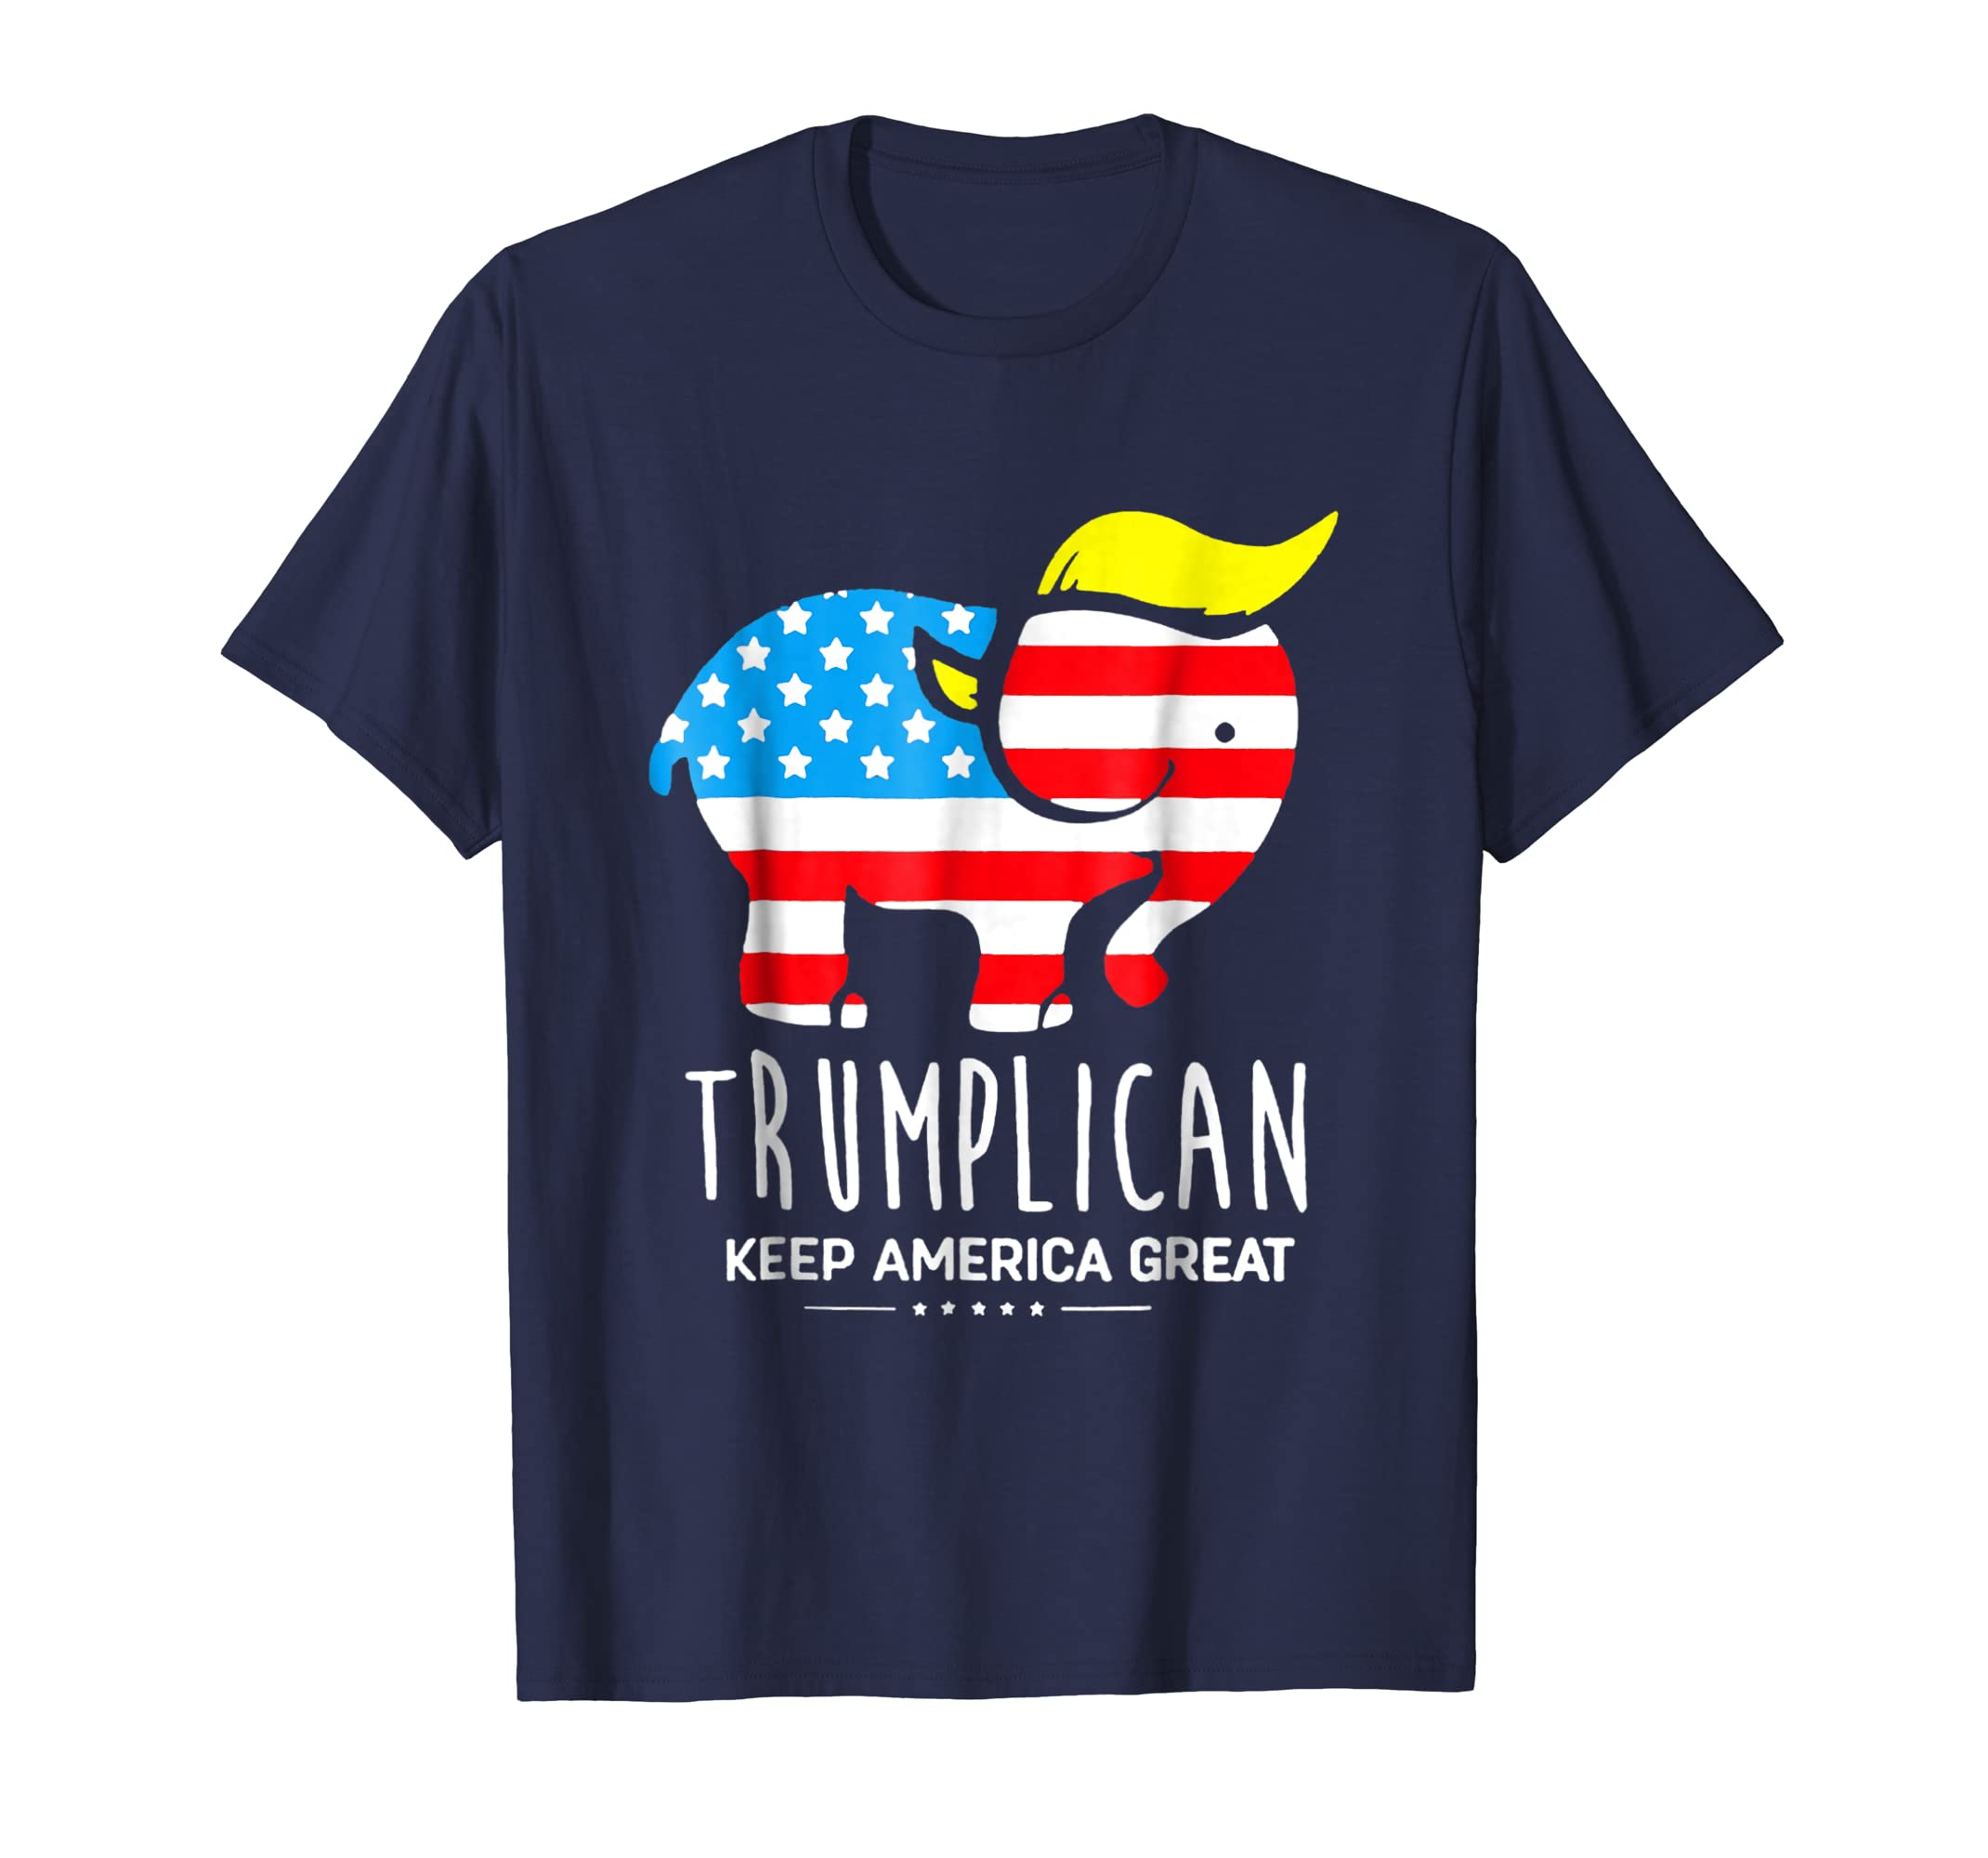 Trumplican Keep America Great T shirt-azvn